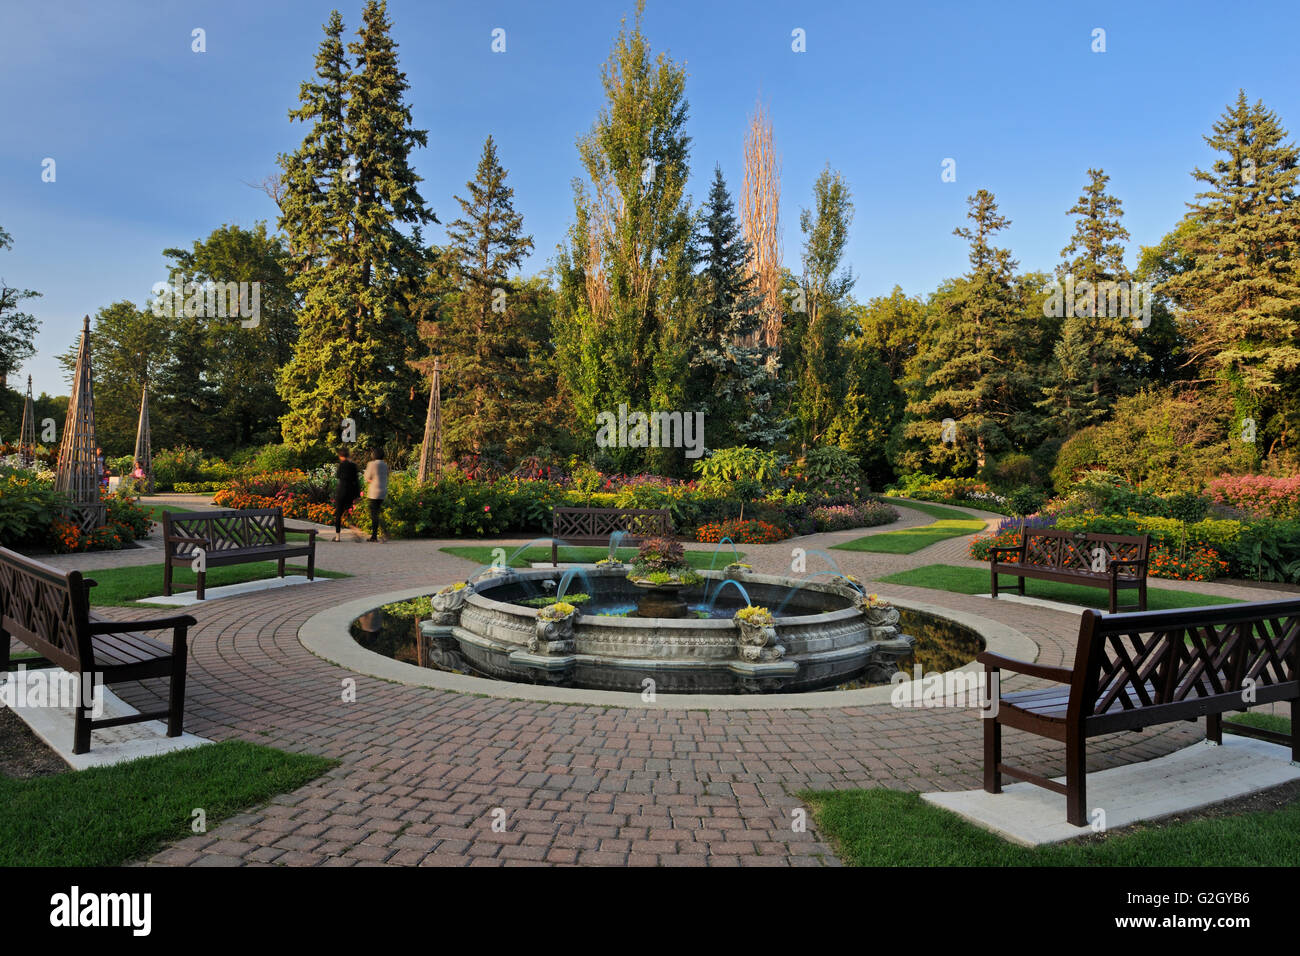 English Gardens. Assiniboine Park Winnipeg Manitoba Canada - Stock Image